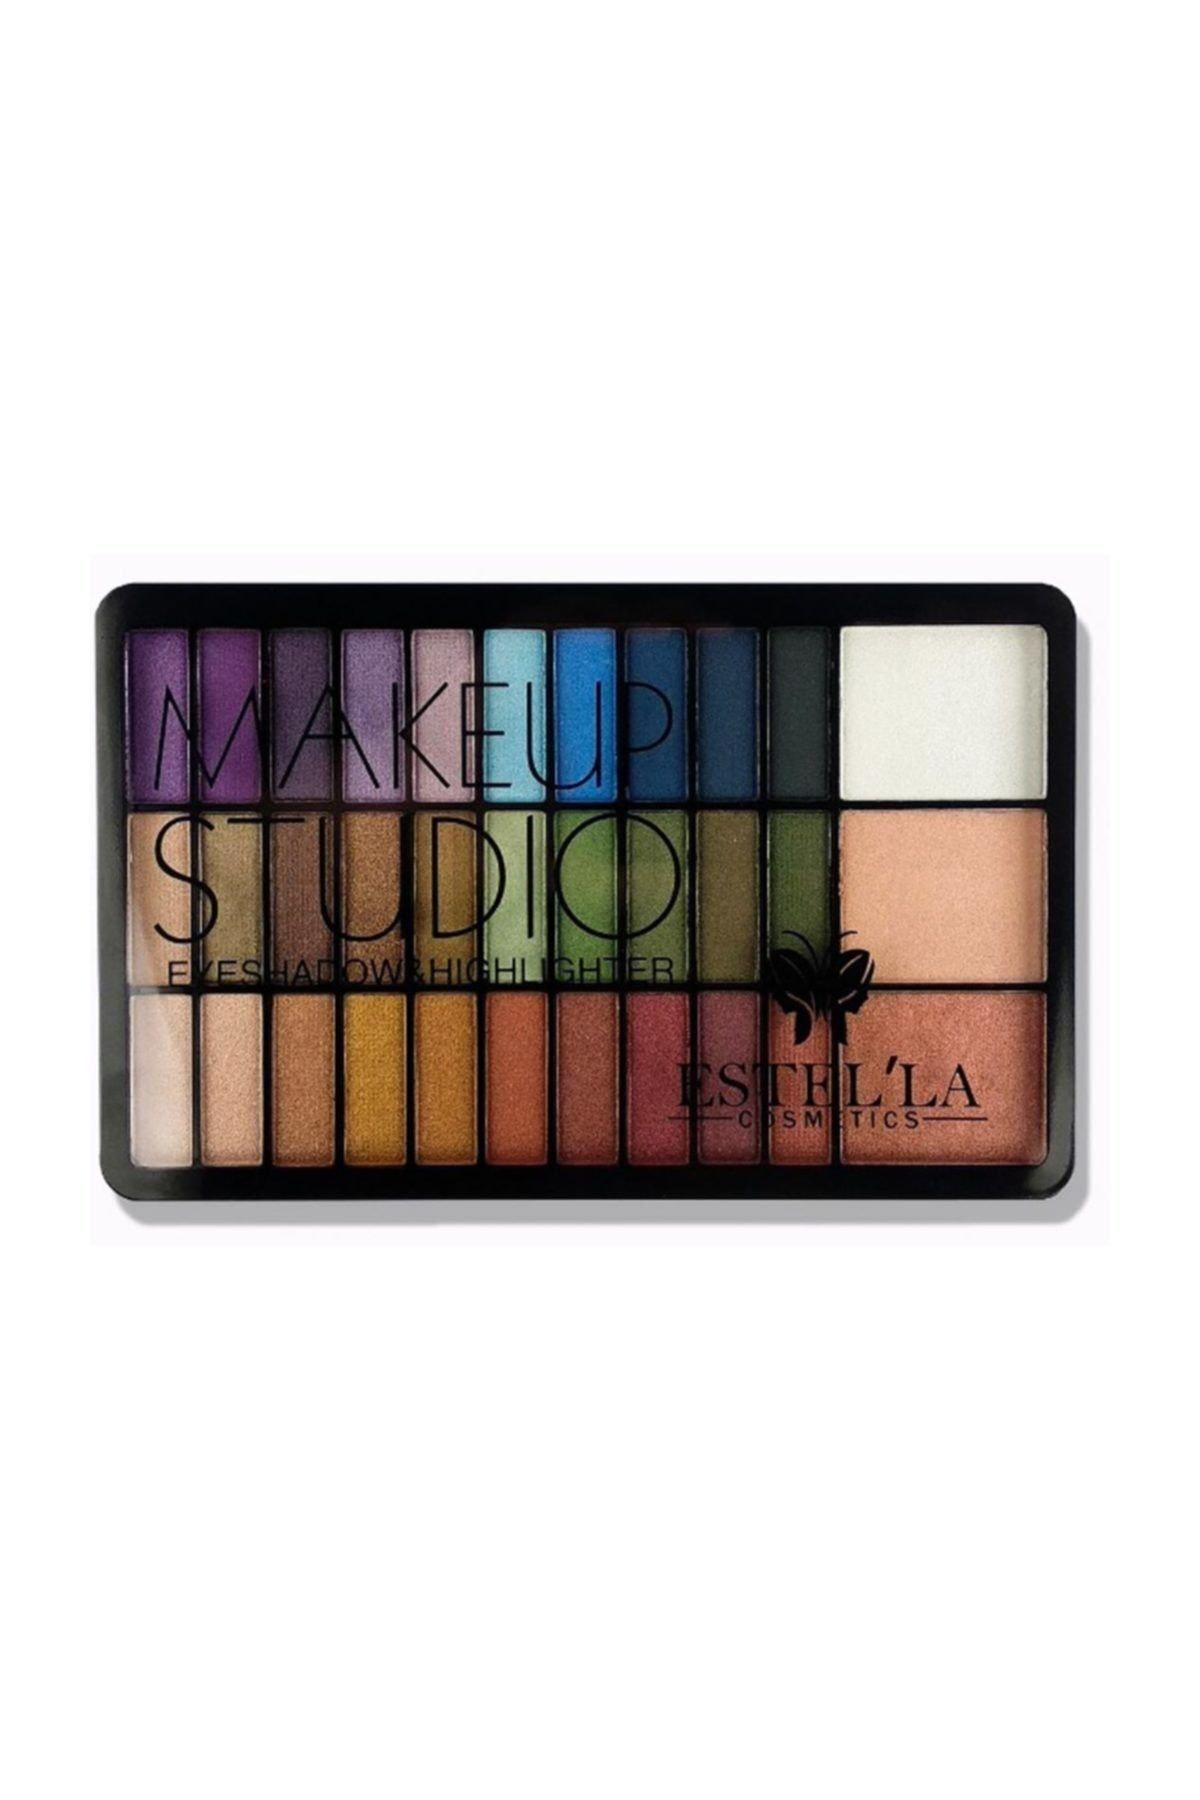 Estella Makeup Studio 33'li Set Renkli Far Paleti 1